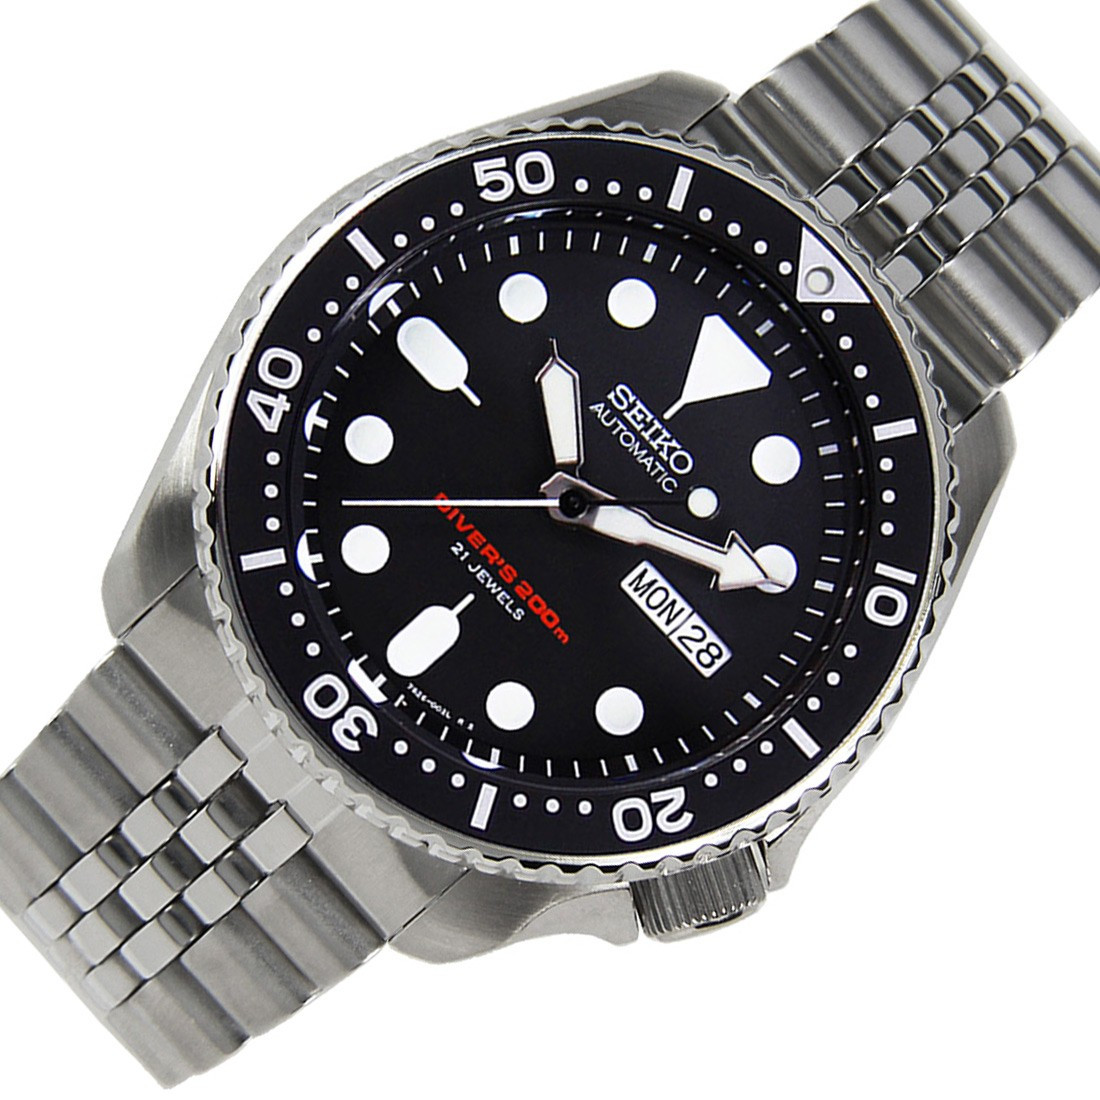 Часы Seiko SKX007K2 Automatic Diver's